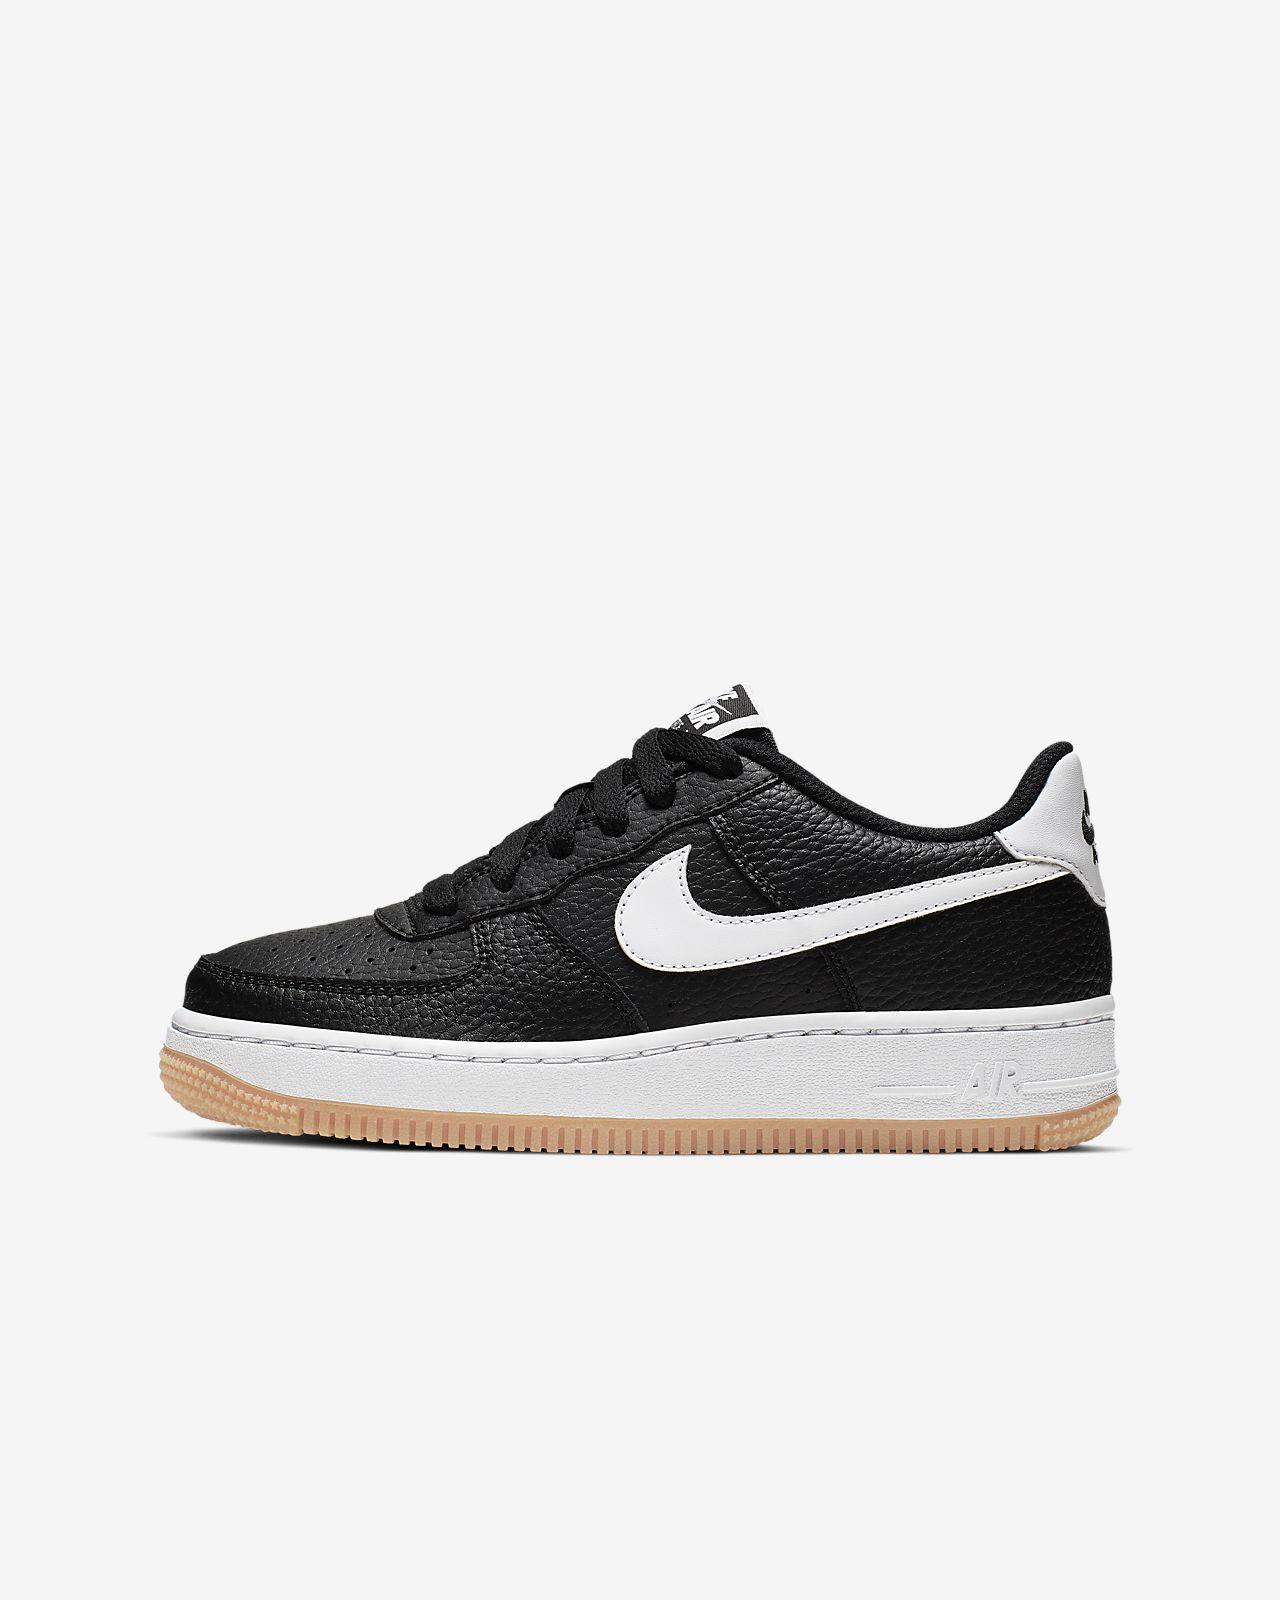 Nike Air Force Sportschuhe Basketball Schuh schwarz blau